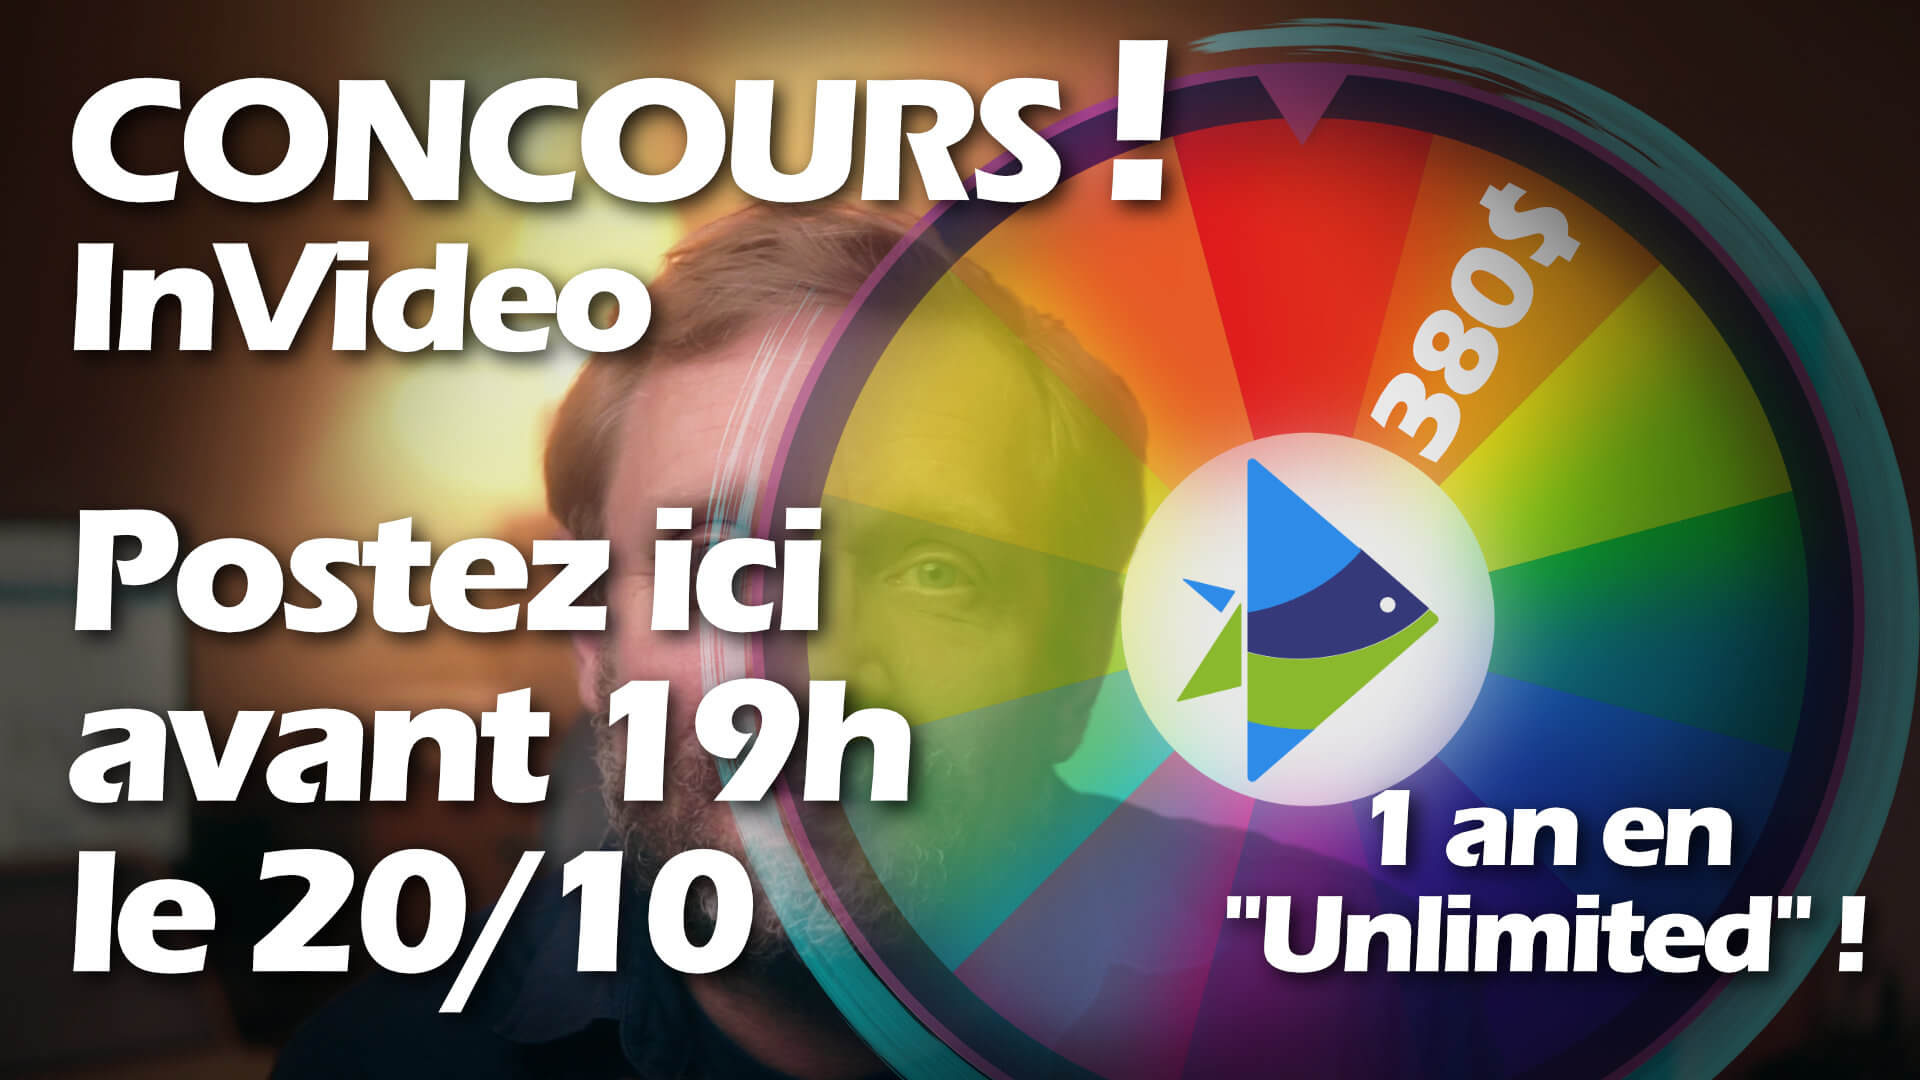 Concours InVideo